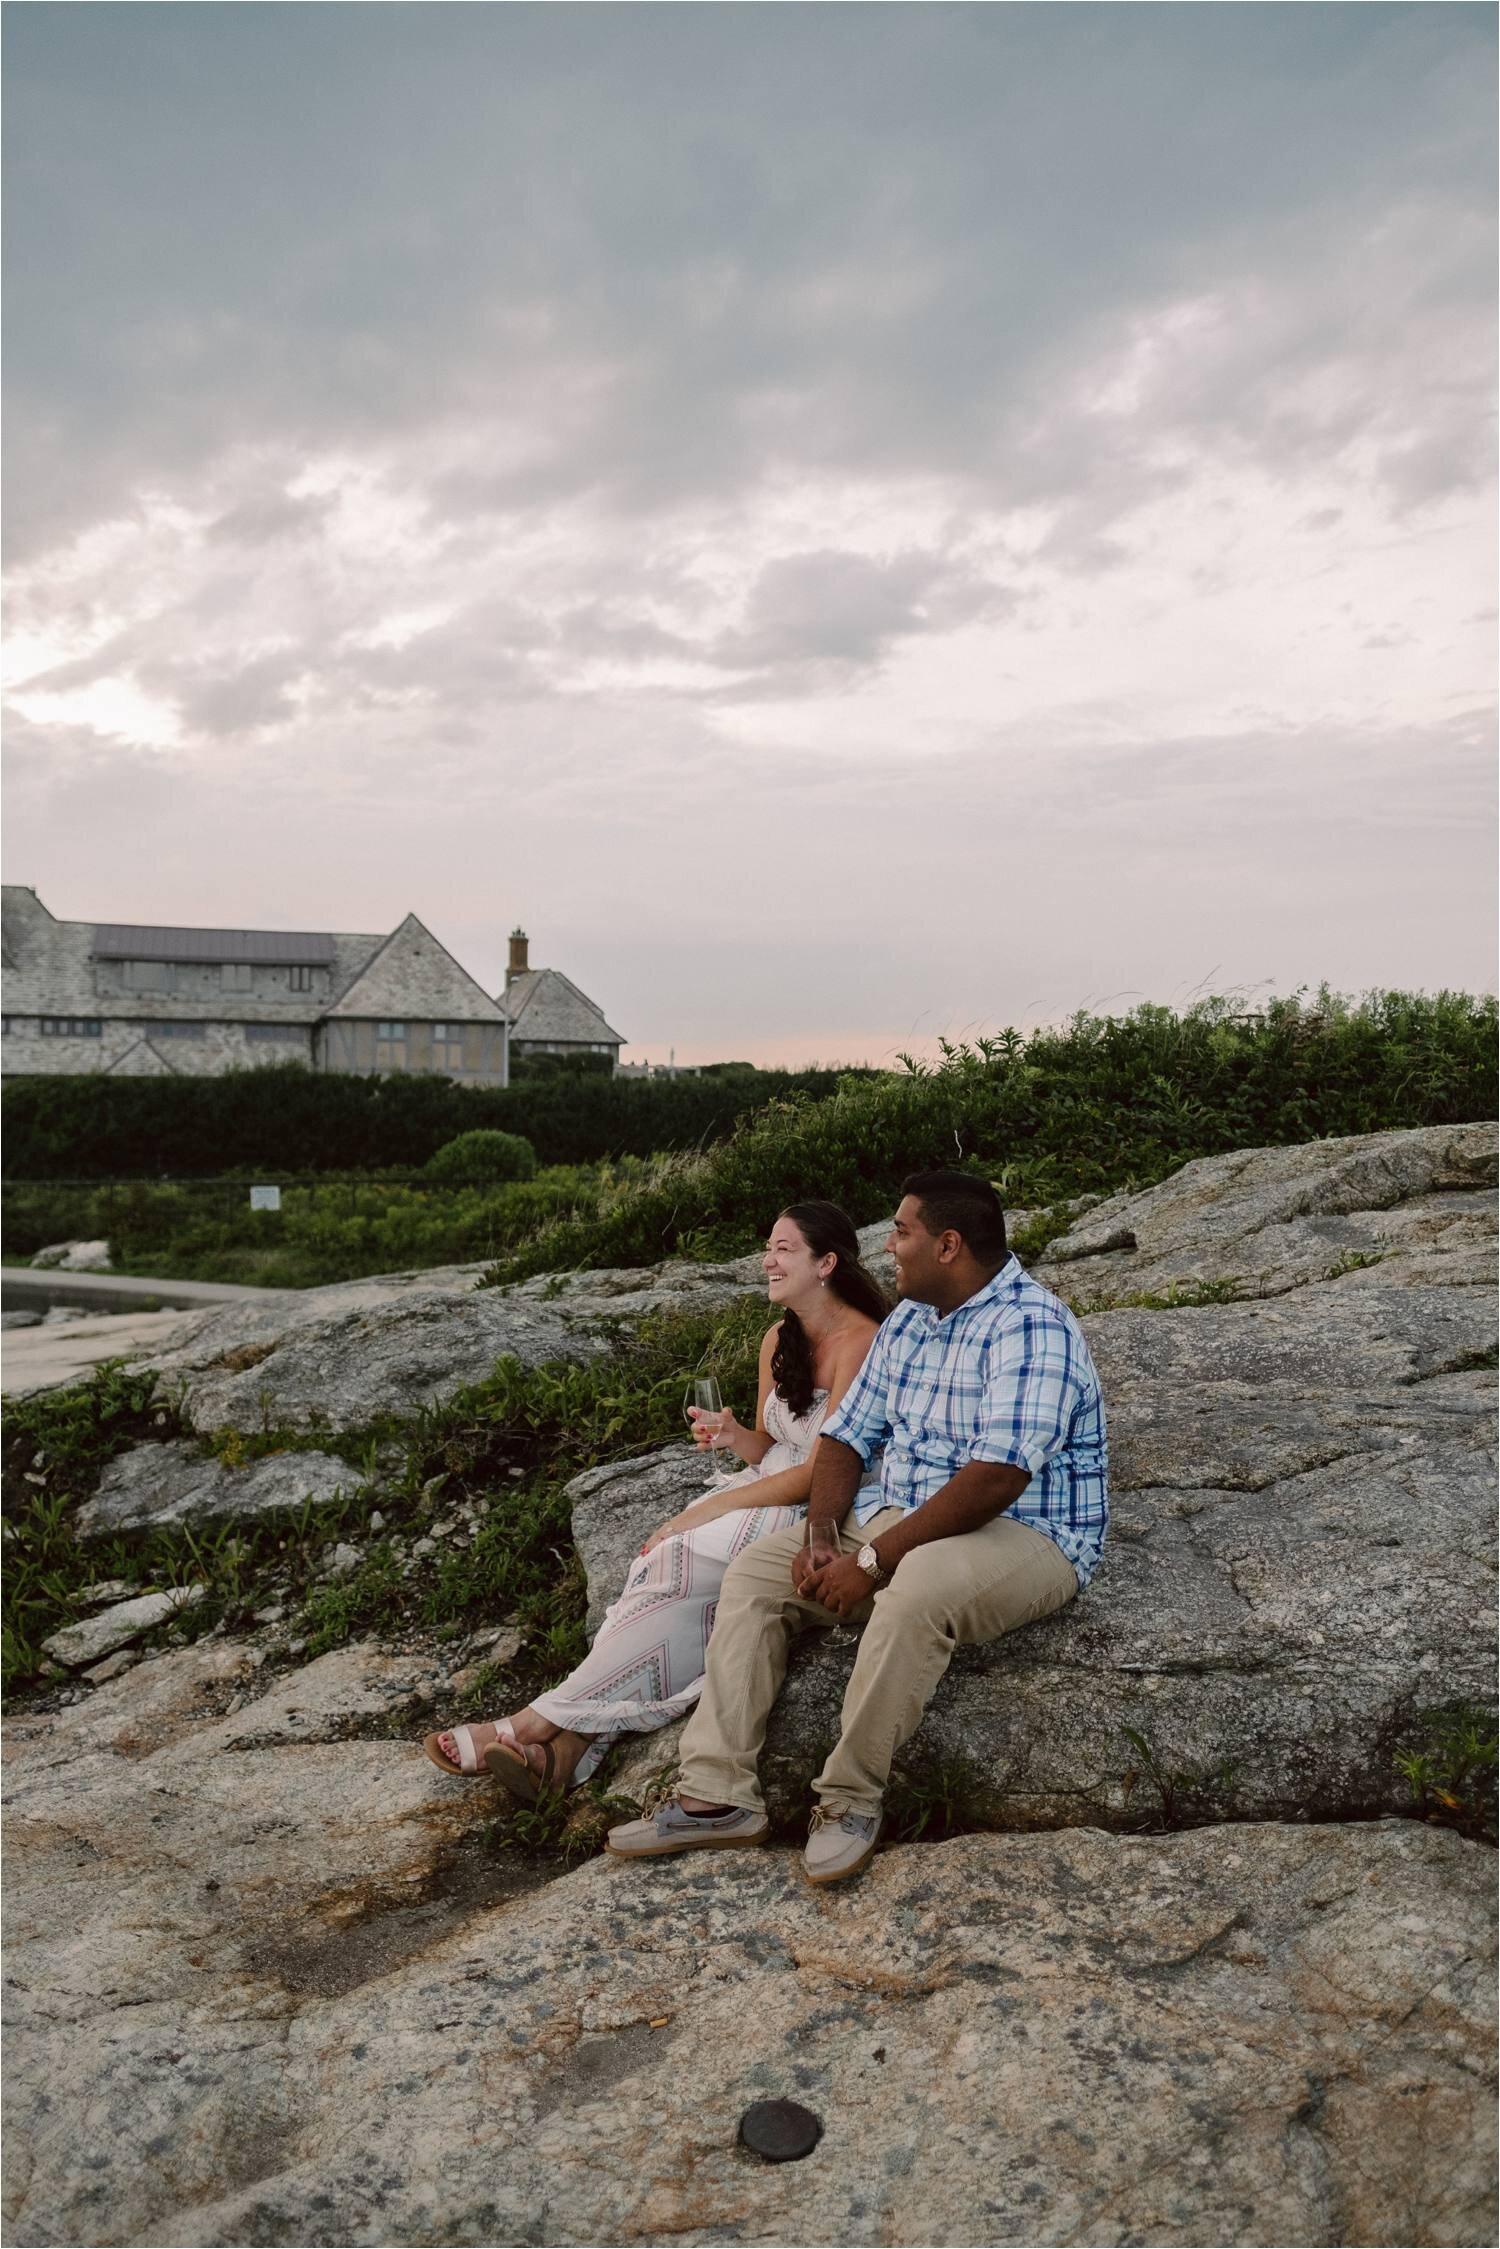 Newport Cliff Walk Proposal - Newport Rhode Island Proposal - Jemima Richards